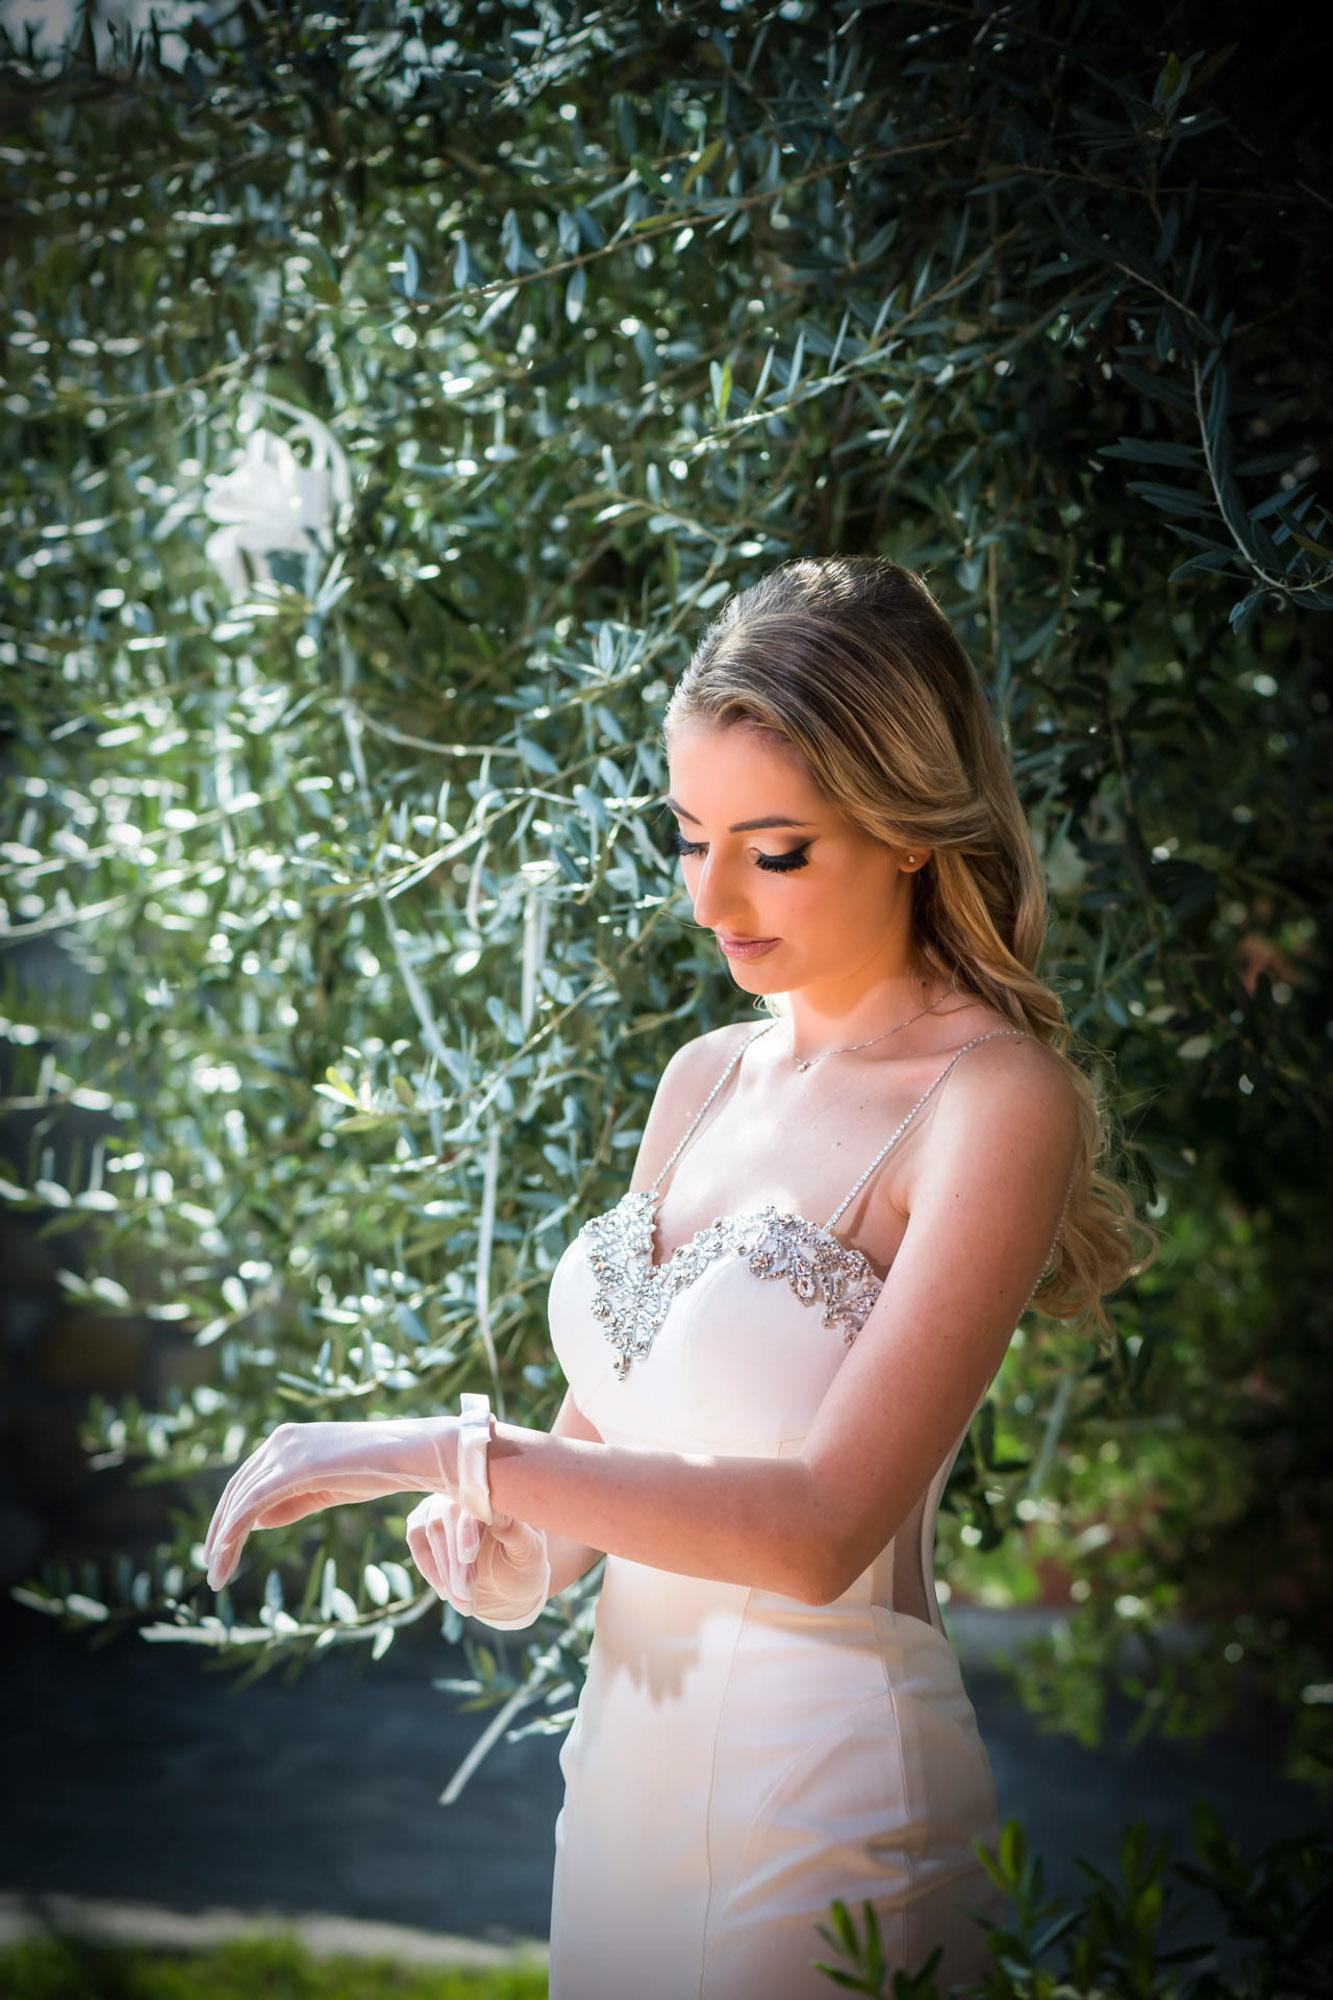 villa mondragone – loretifoto – reportage matrimonio roma – fotografo frascati-5